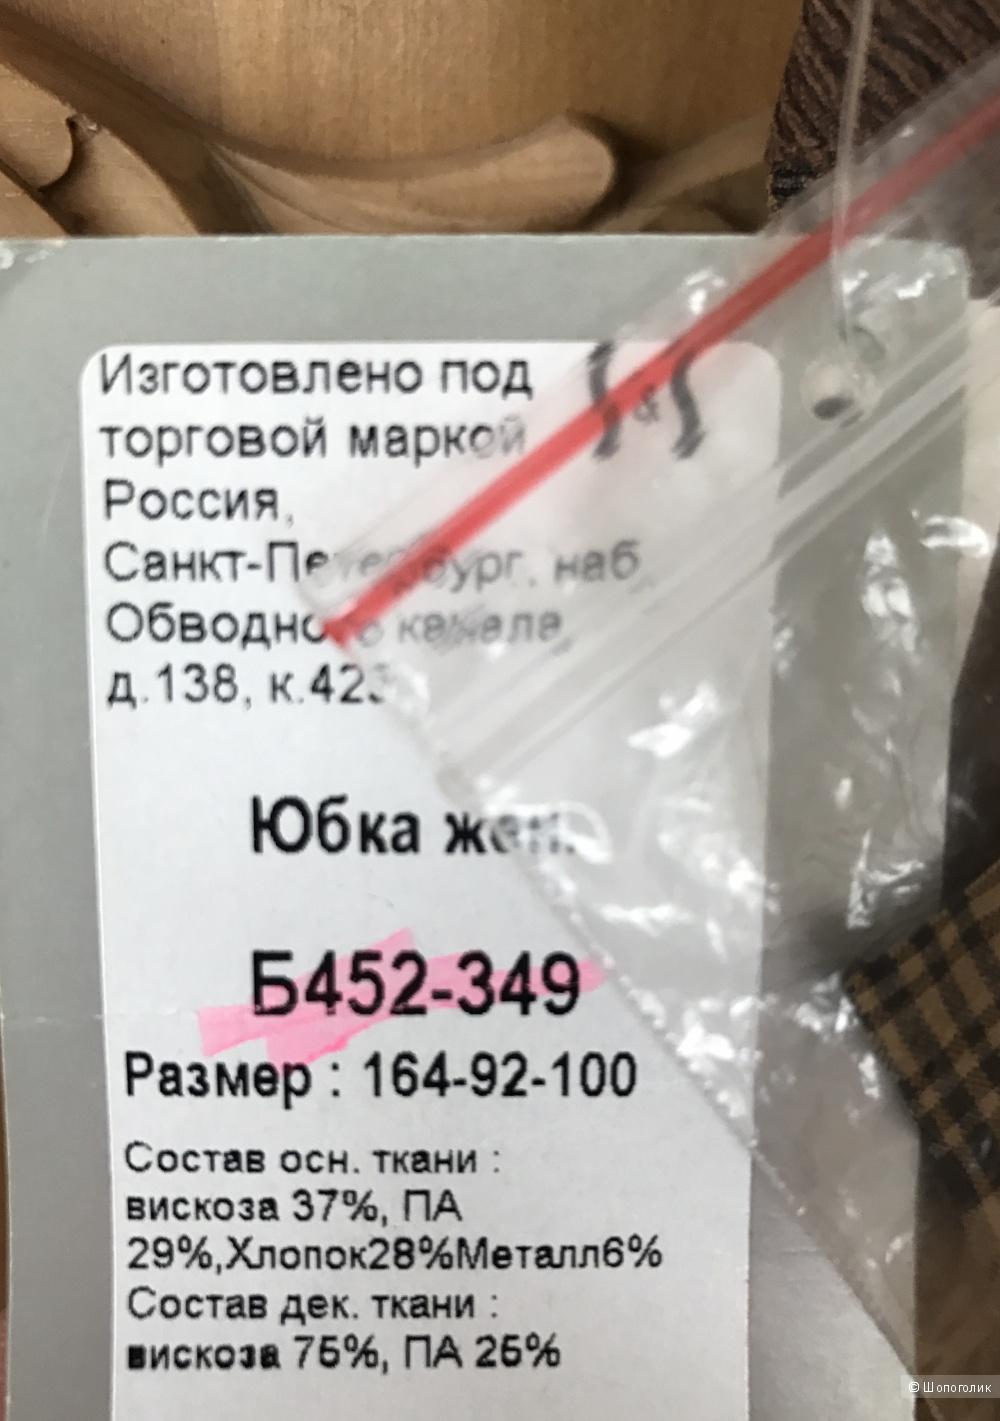 Юбка S&S by S.Zotova размер 46